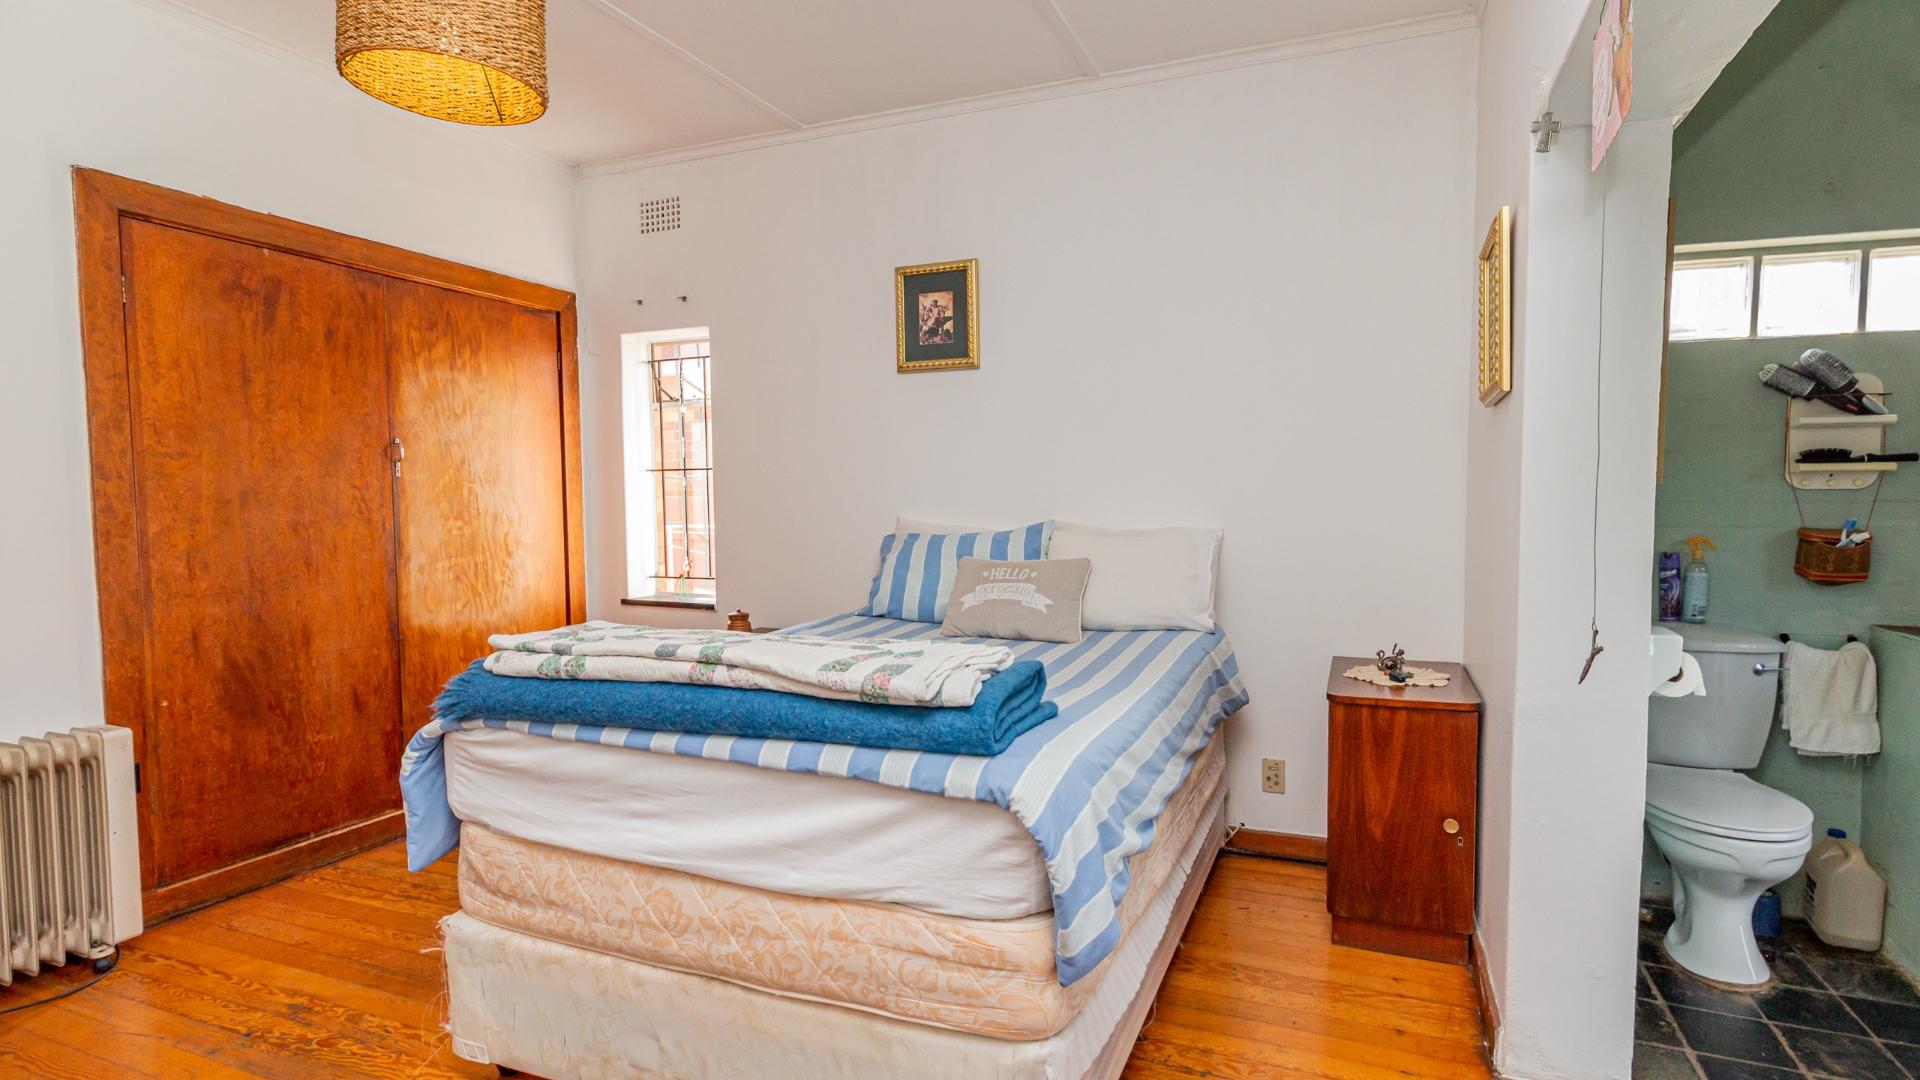 4 Bedroom House For Sale in Westdene